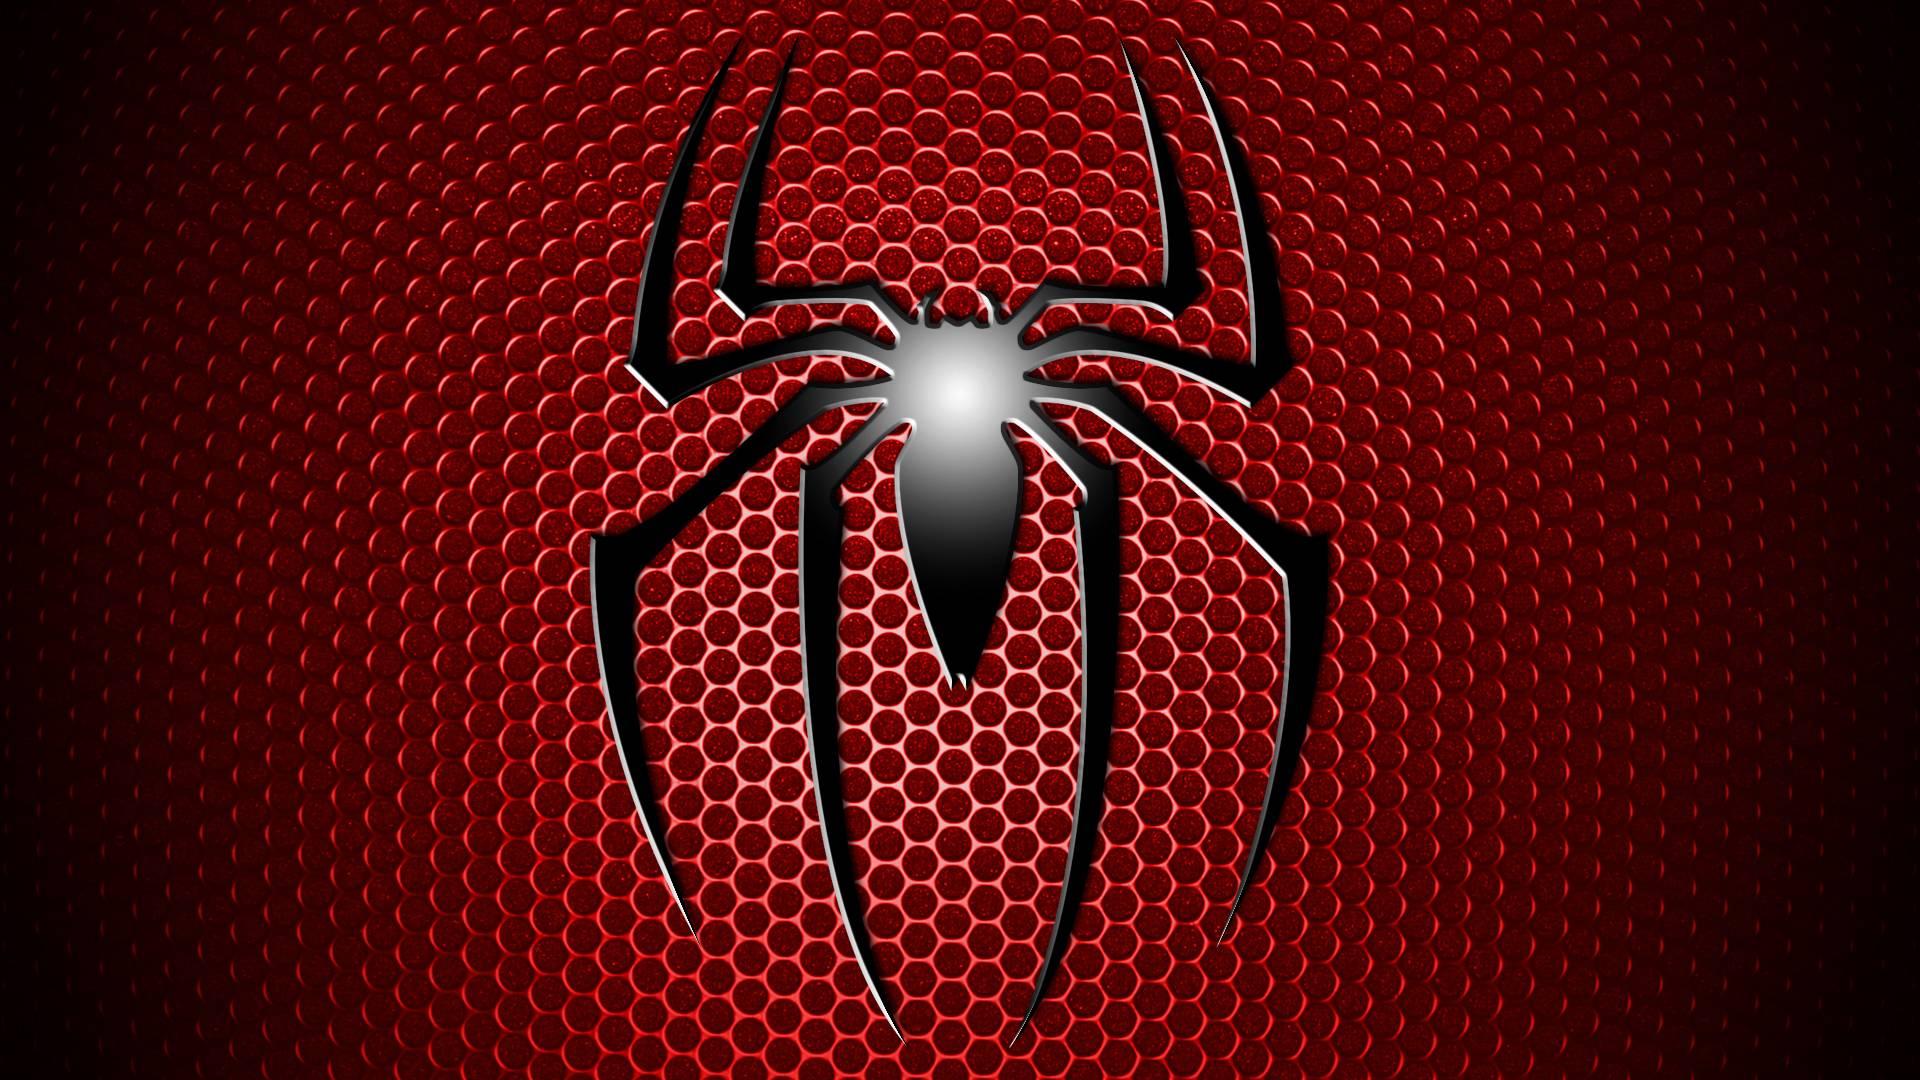 Hd wallpaper spiderman - 482 Spider Man Wallpapers Spider Man Backgrounds